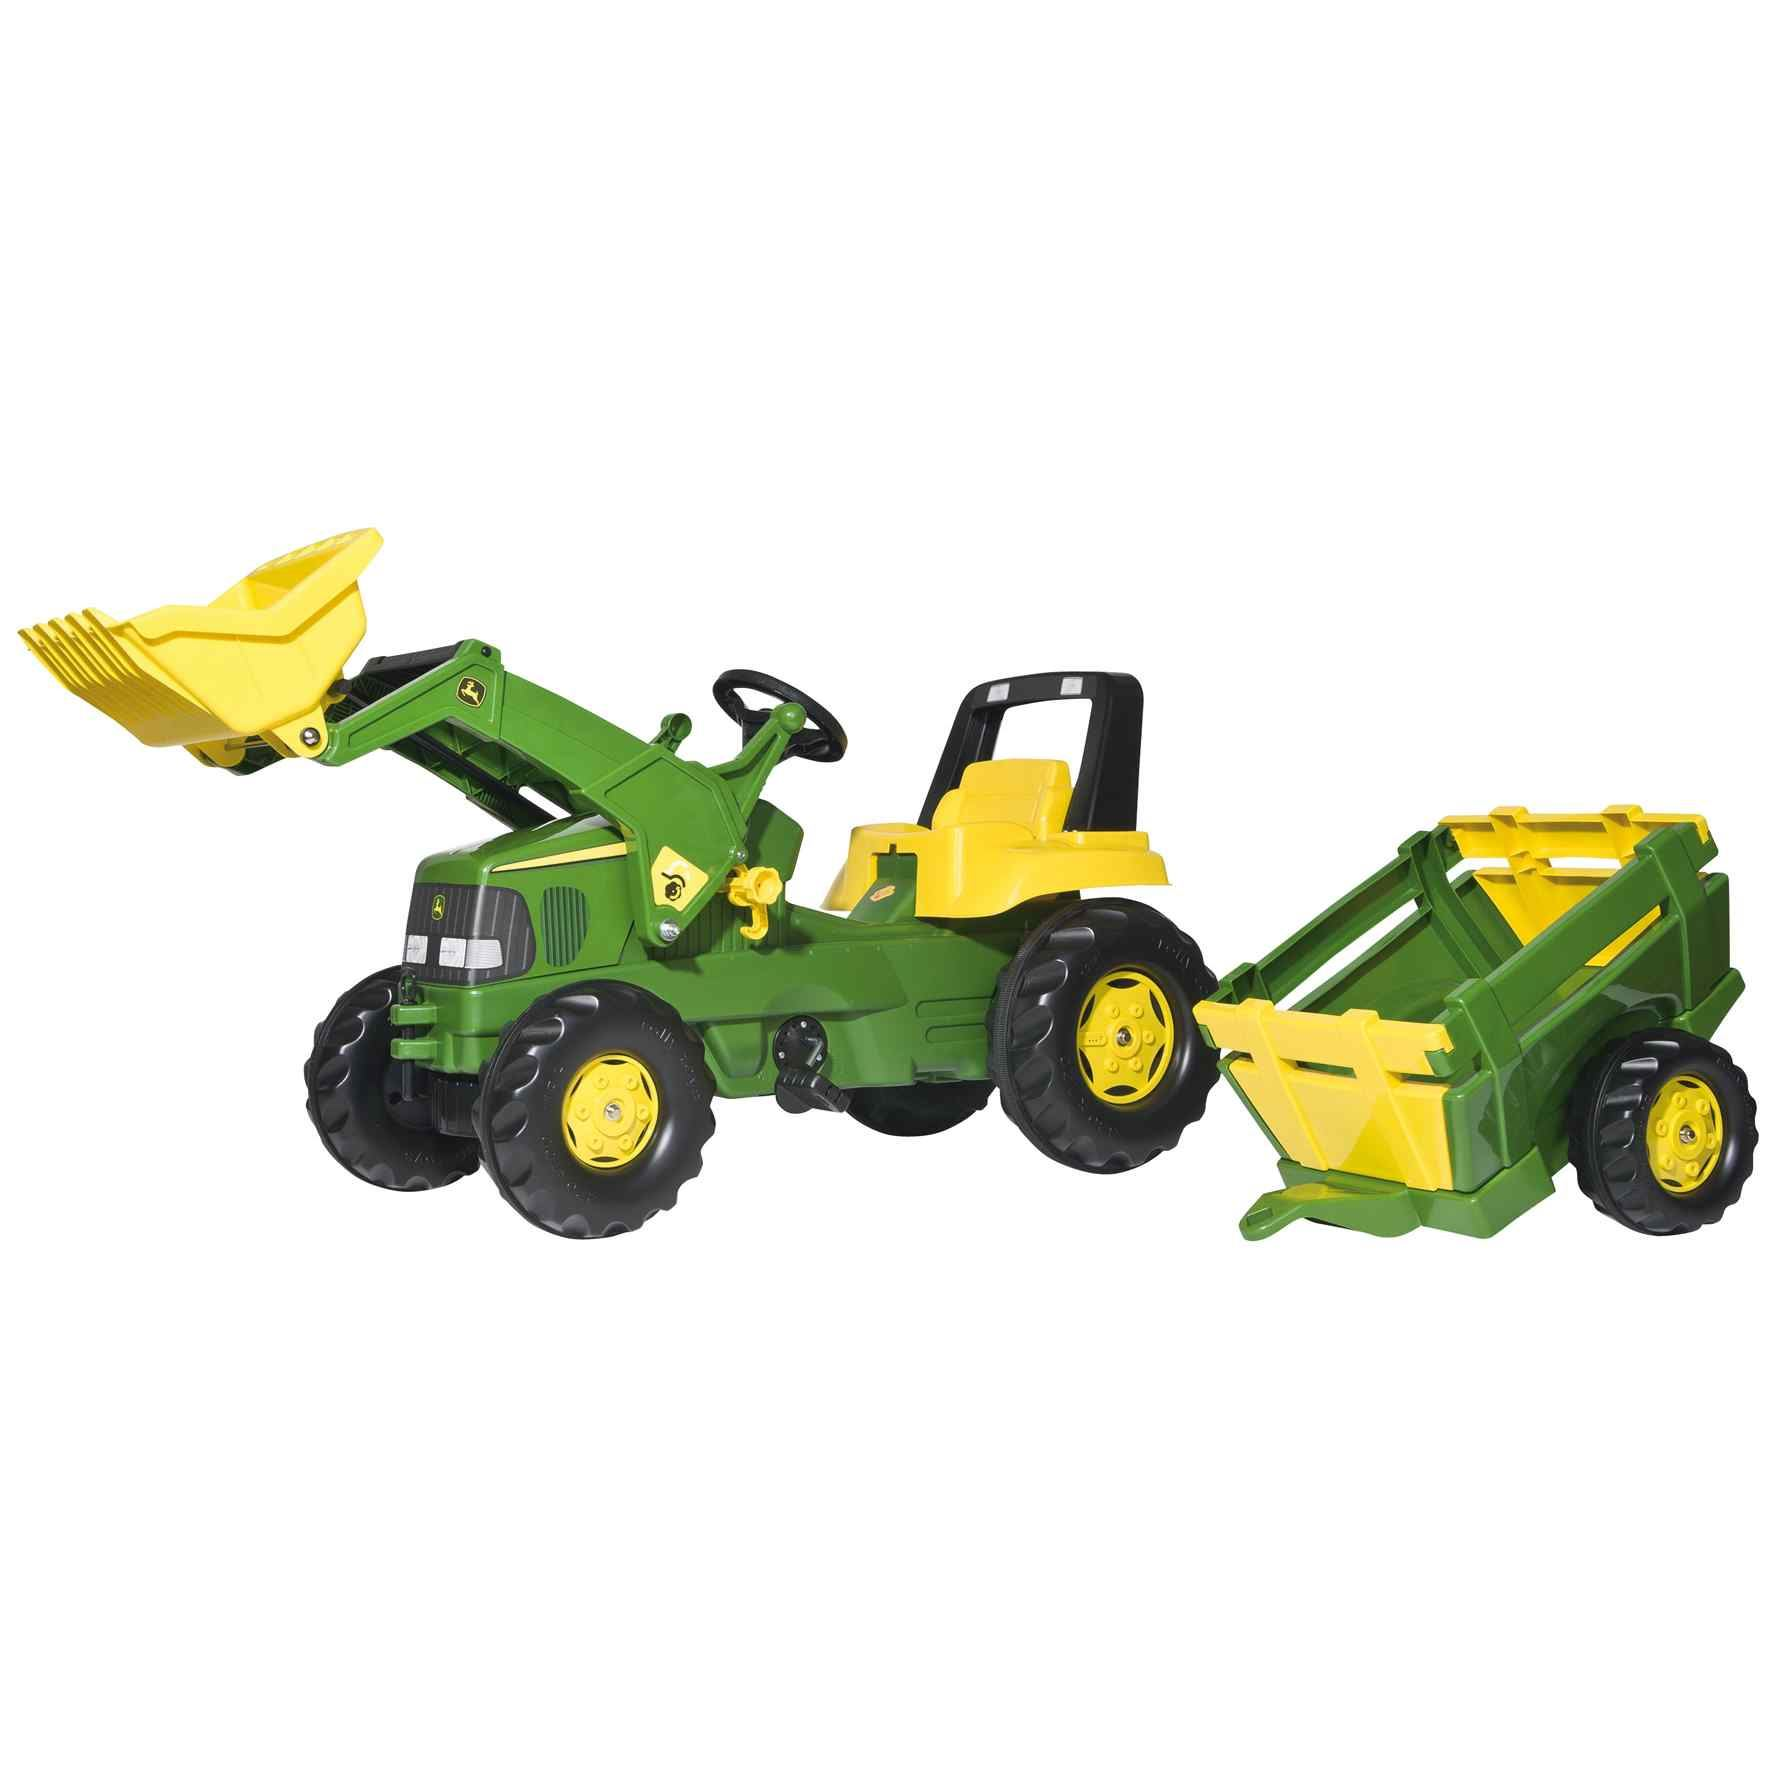 john deere enfants rolly p dale jouet junior tracteur. Black Bedroom Furniture Sets. Home Design Ideas